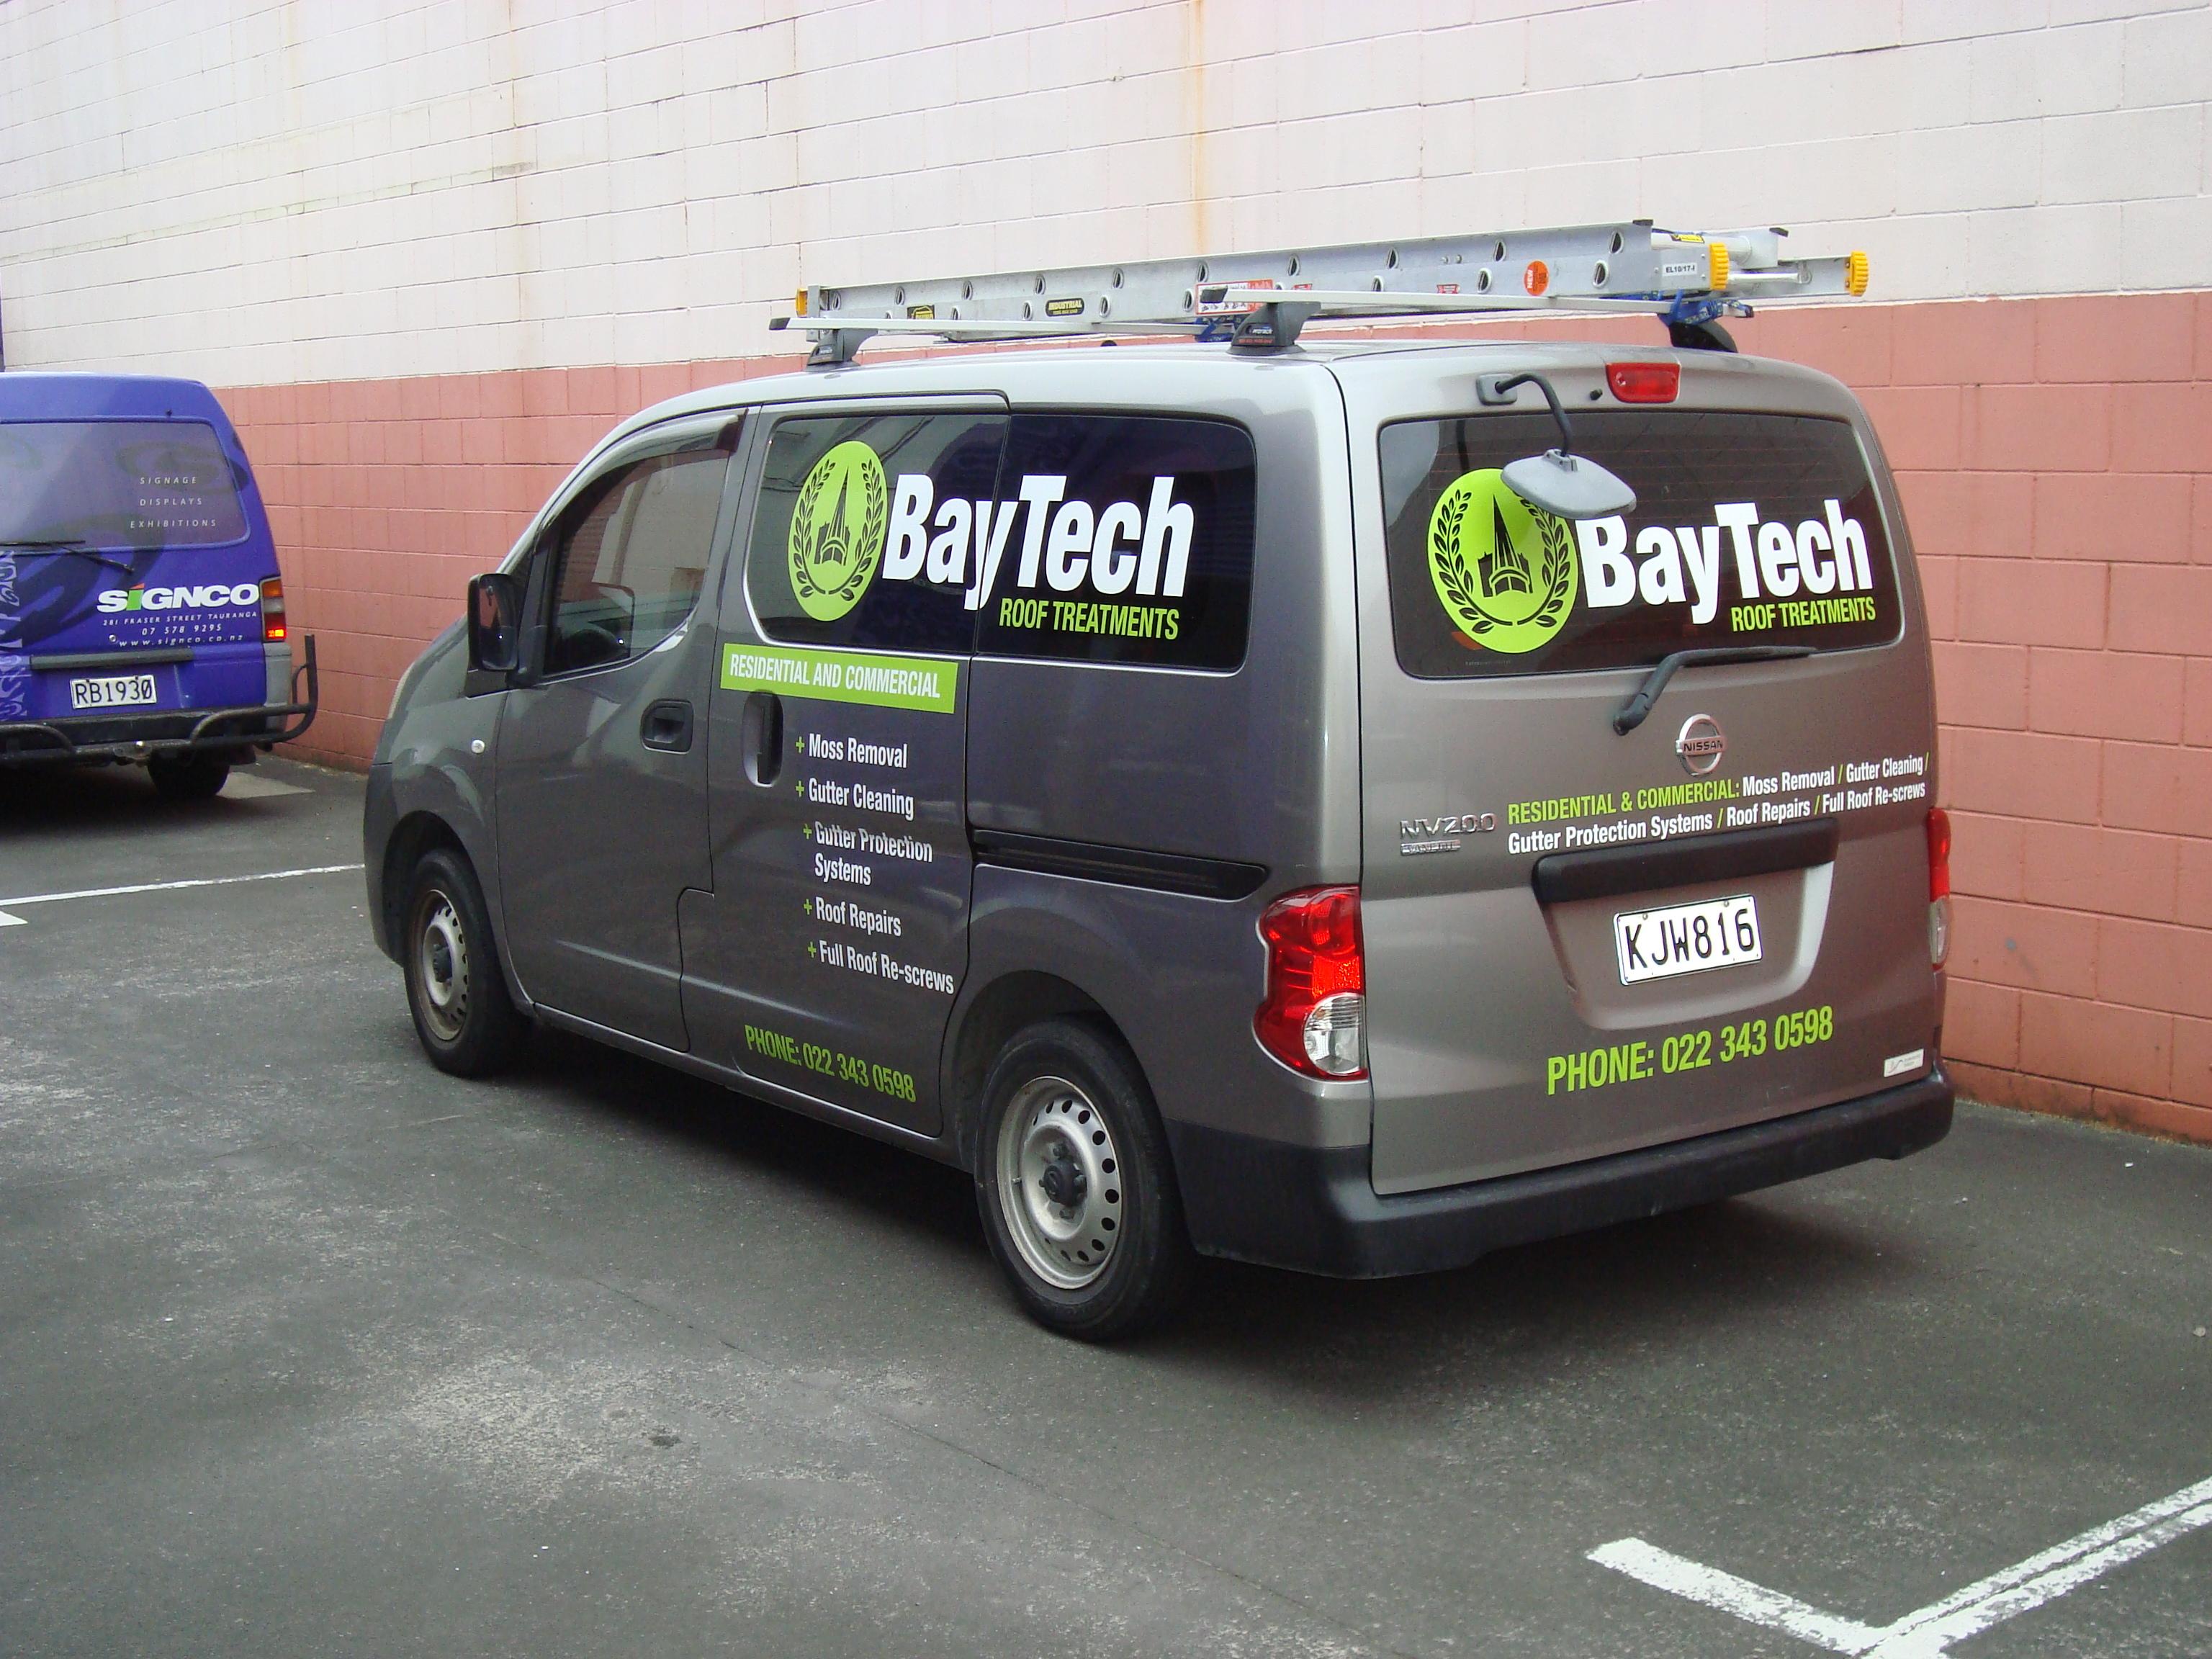 BayTech Roofing Van.JPG